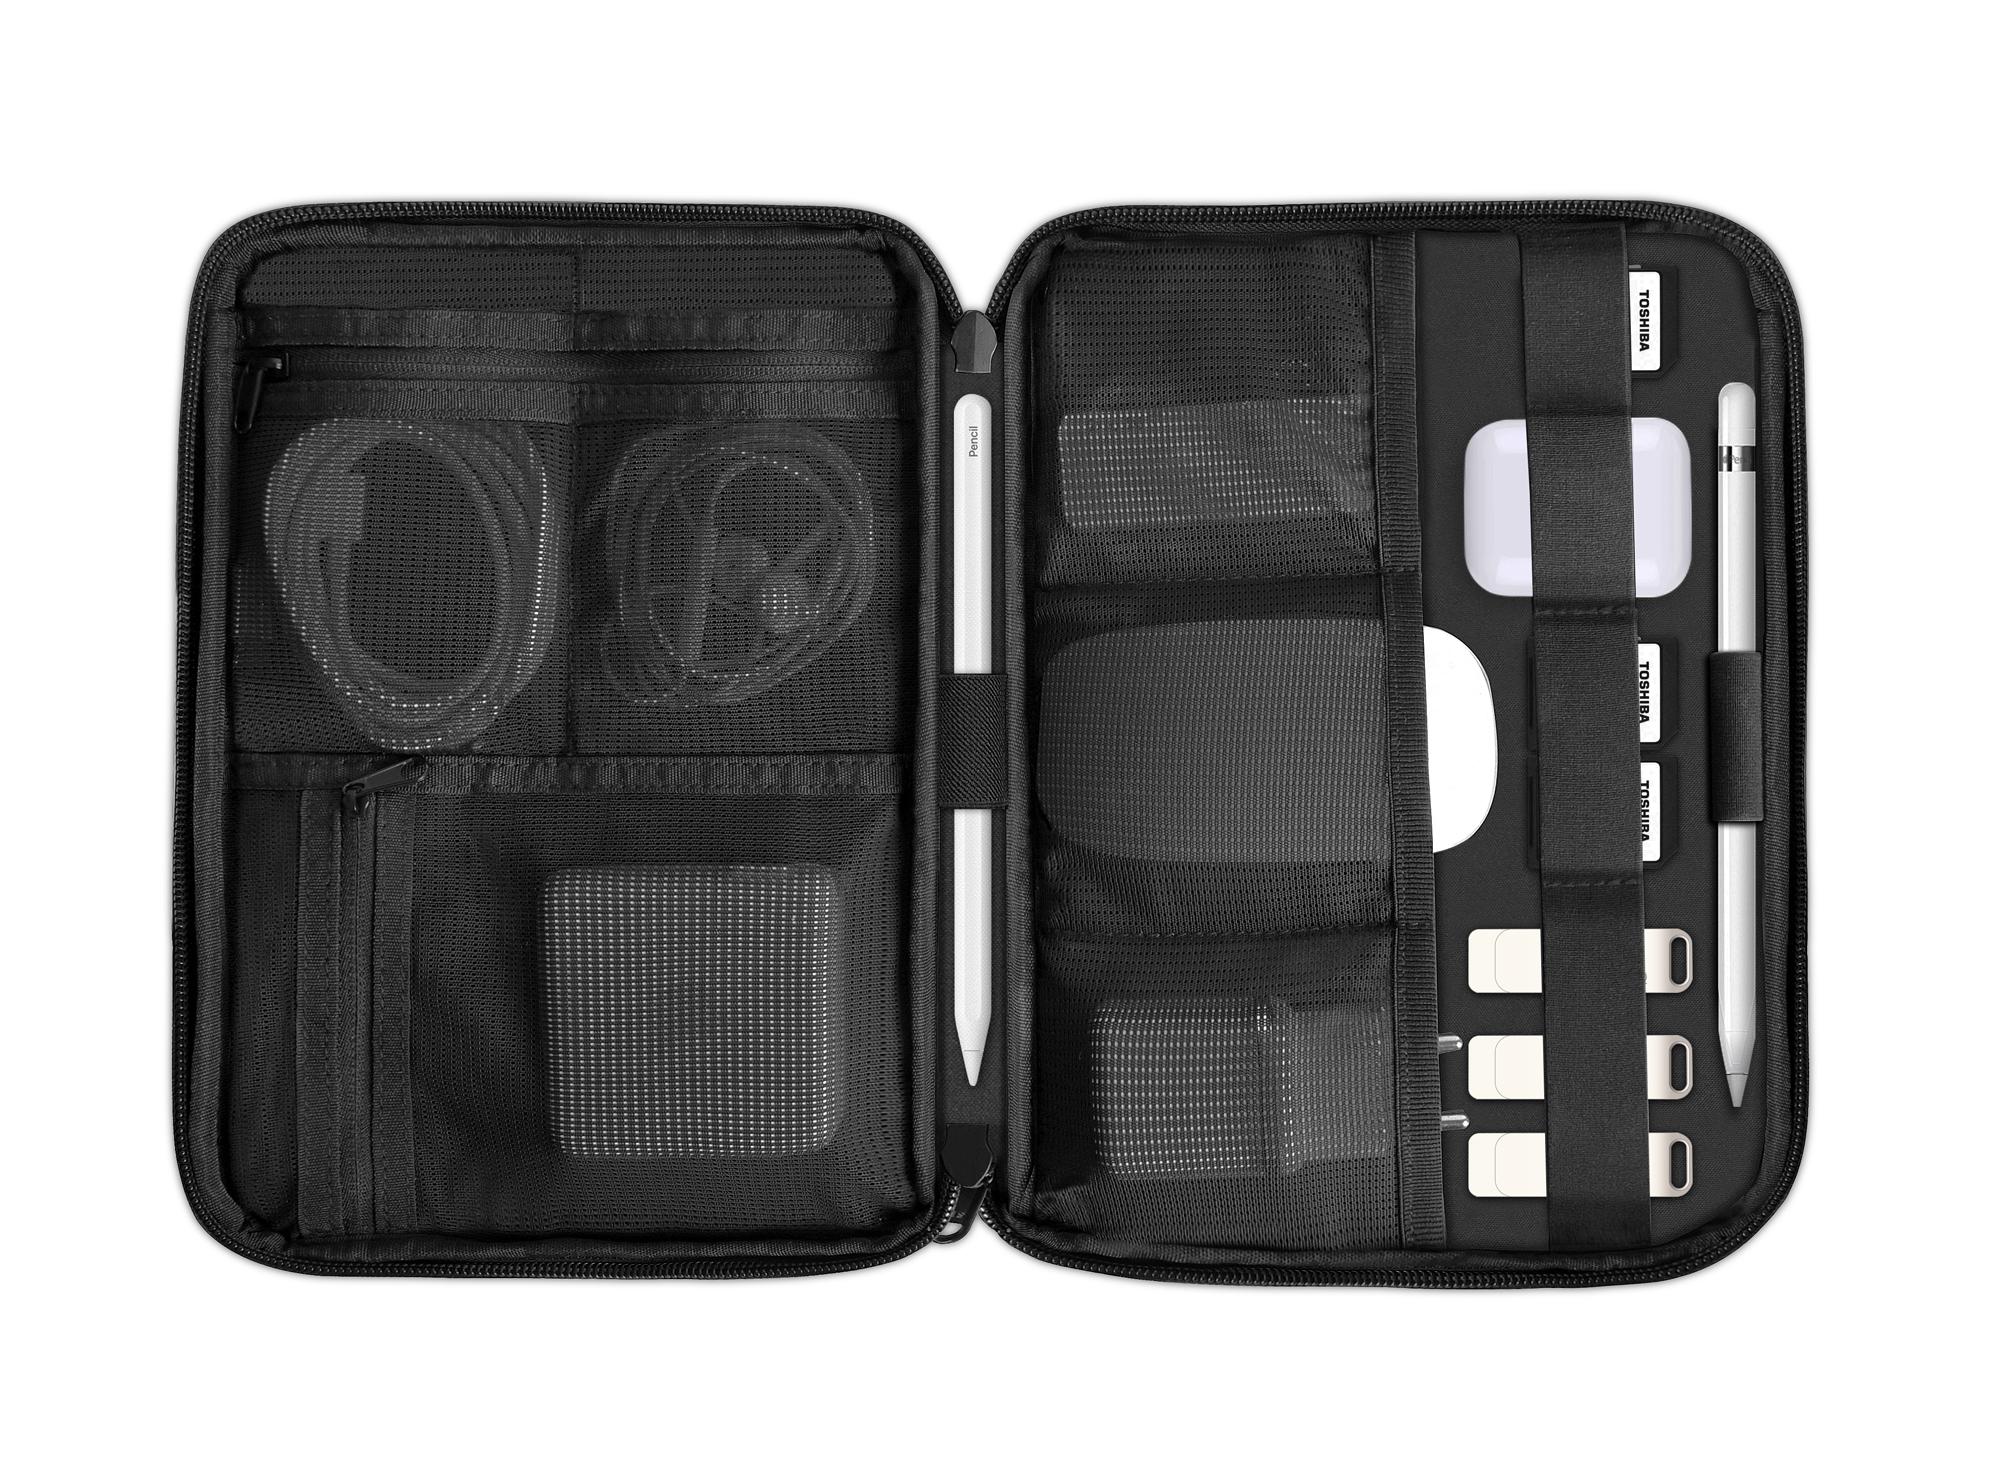 WiWU New Waterproof Storage bag Travel Mate Large Capacity Accessories Cable Passport Organizer Case